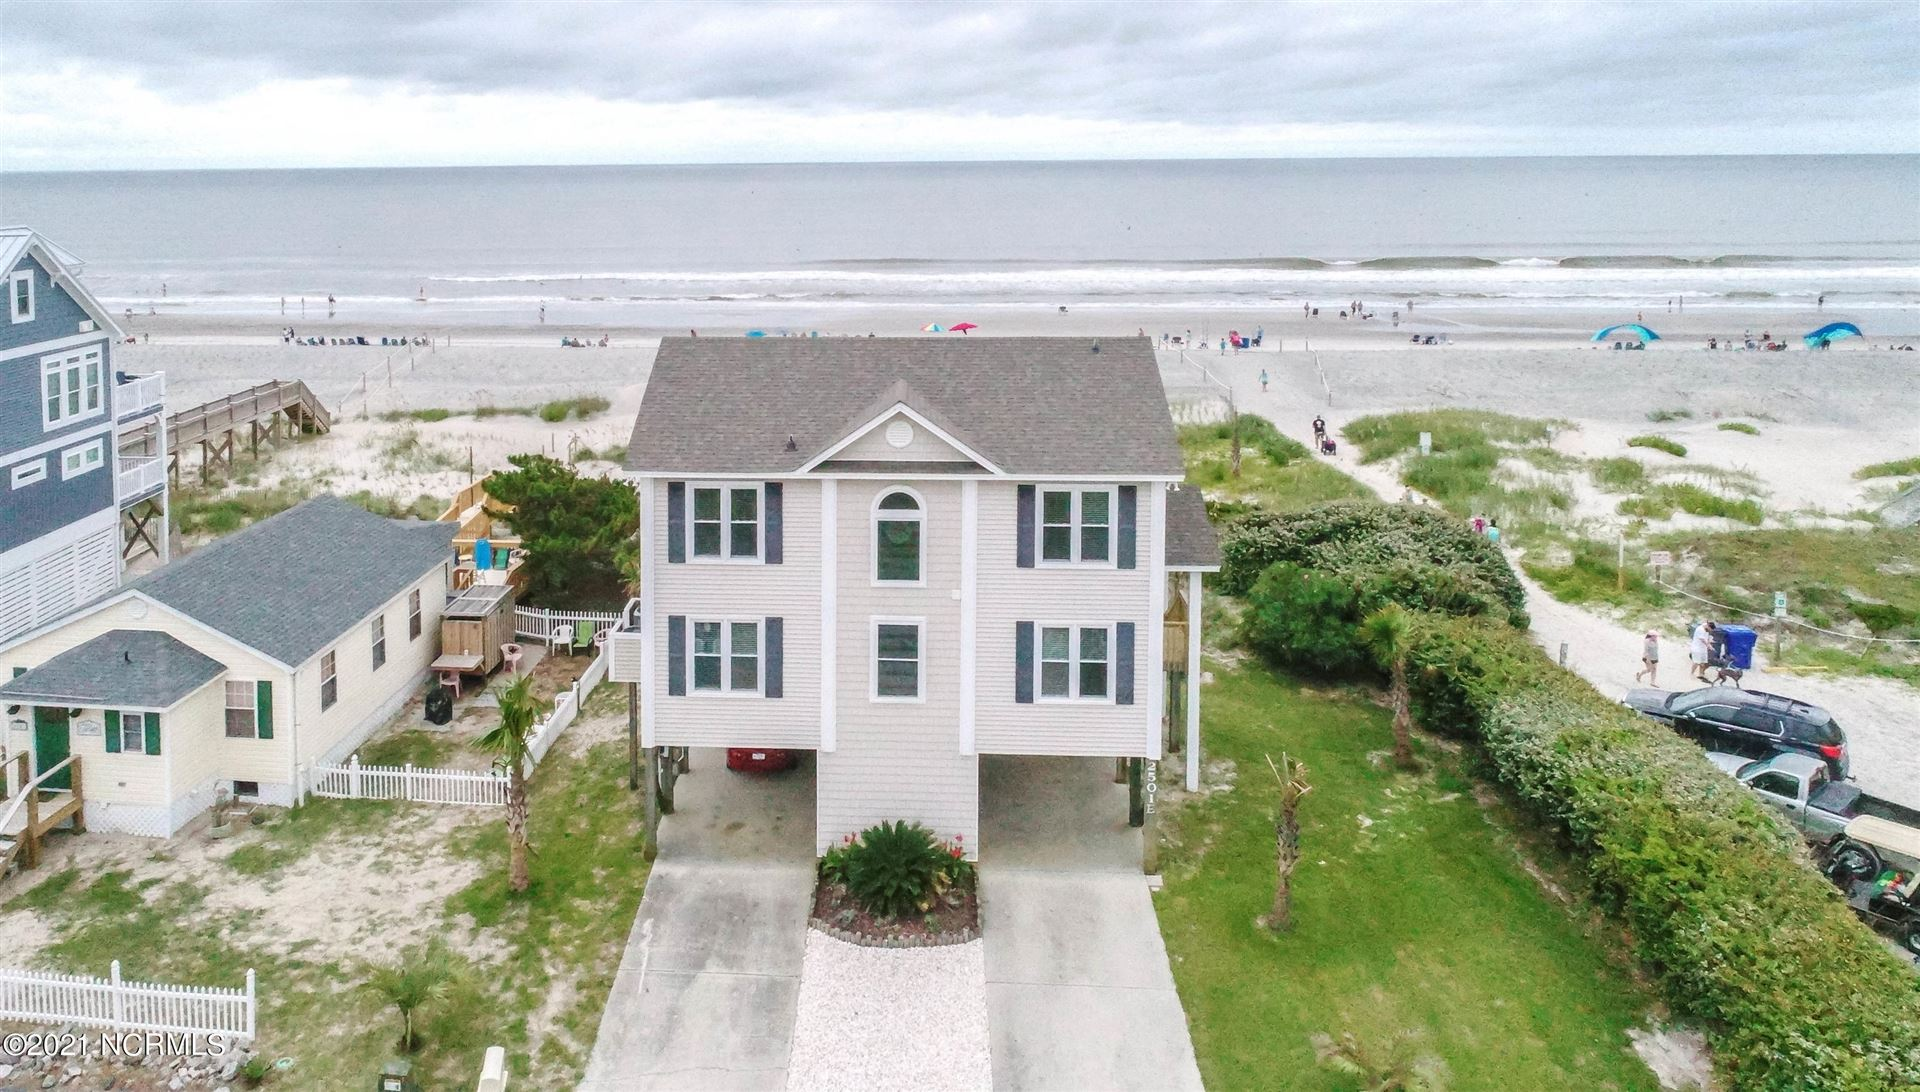 Photo for 2501 E Beach Drive, Oak Island, NC 28465 (MLS # 100284776)